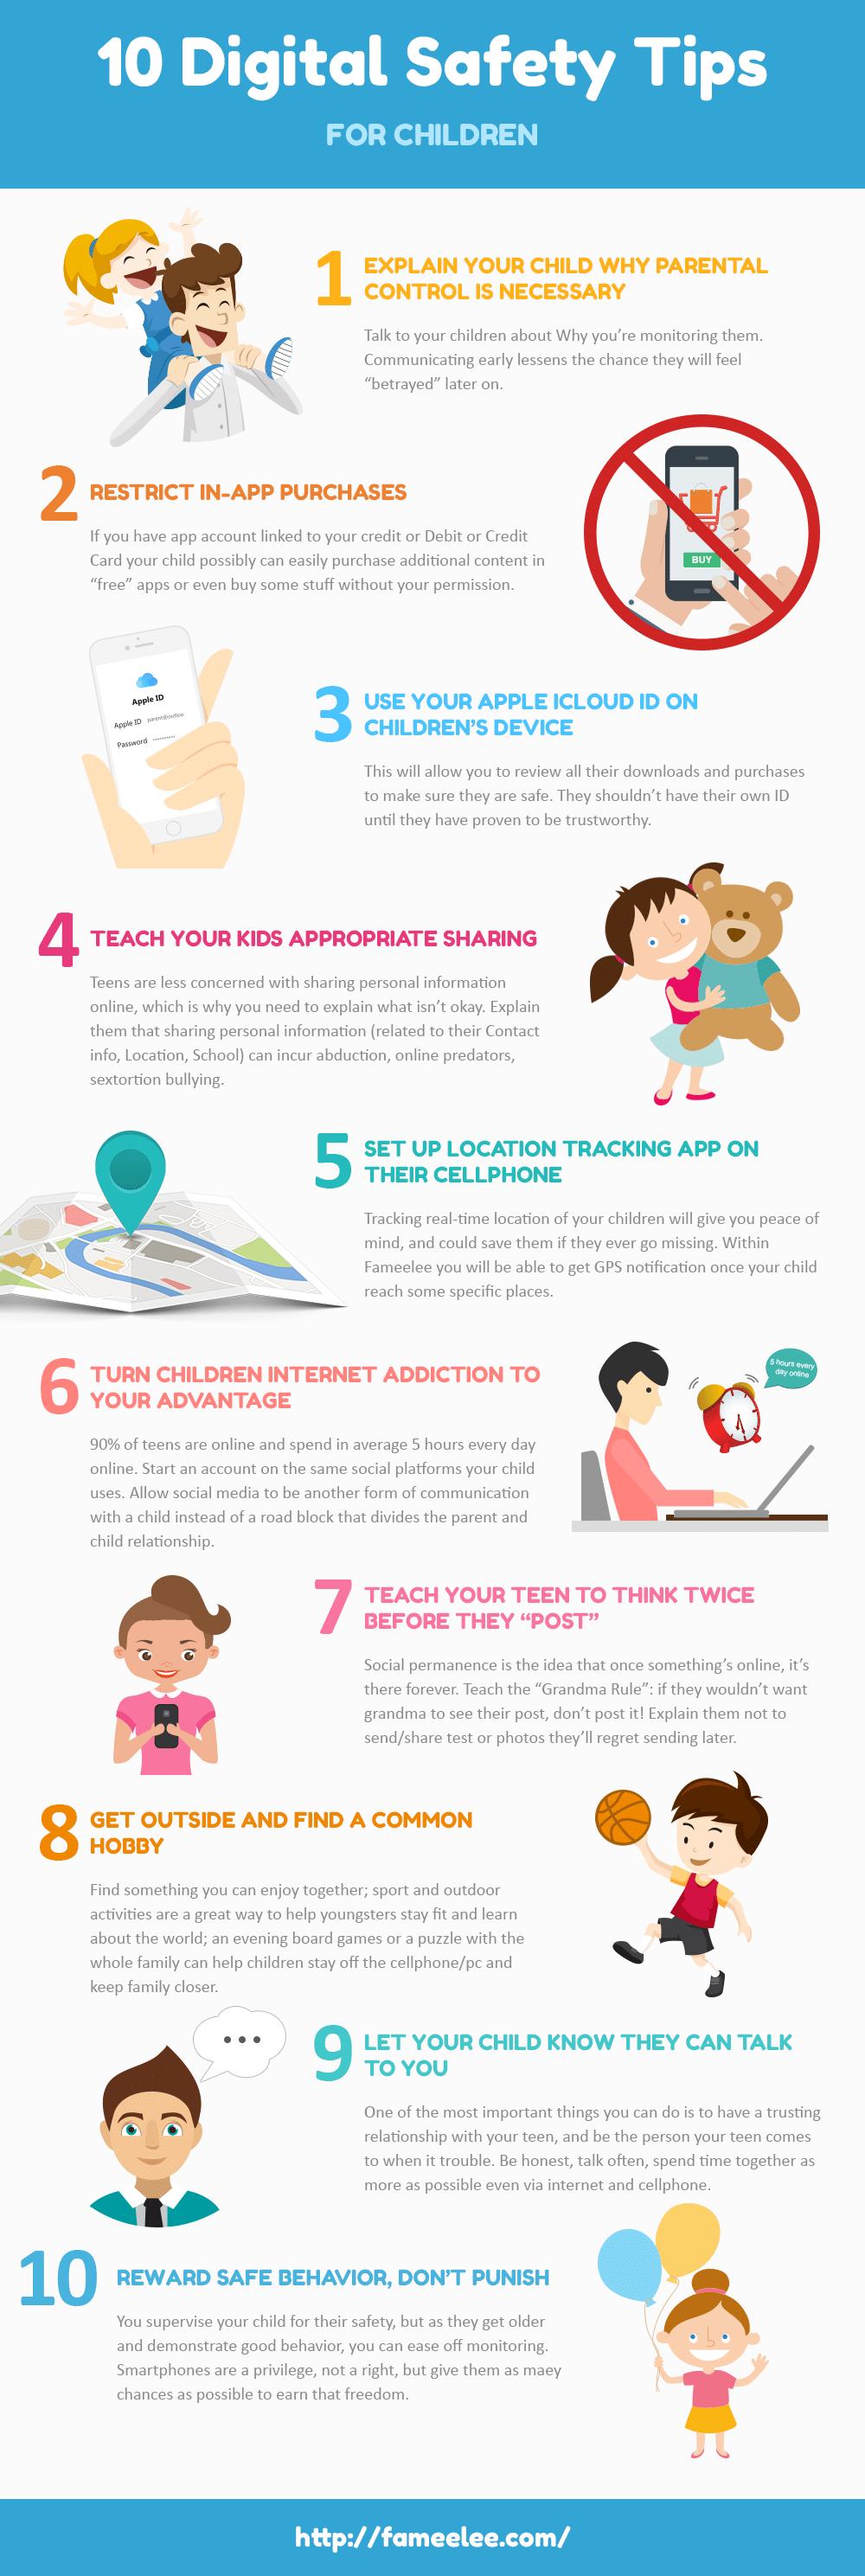 digital safety for children infographic